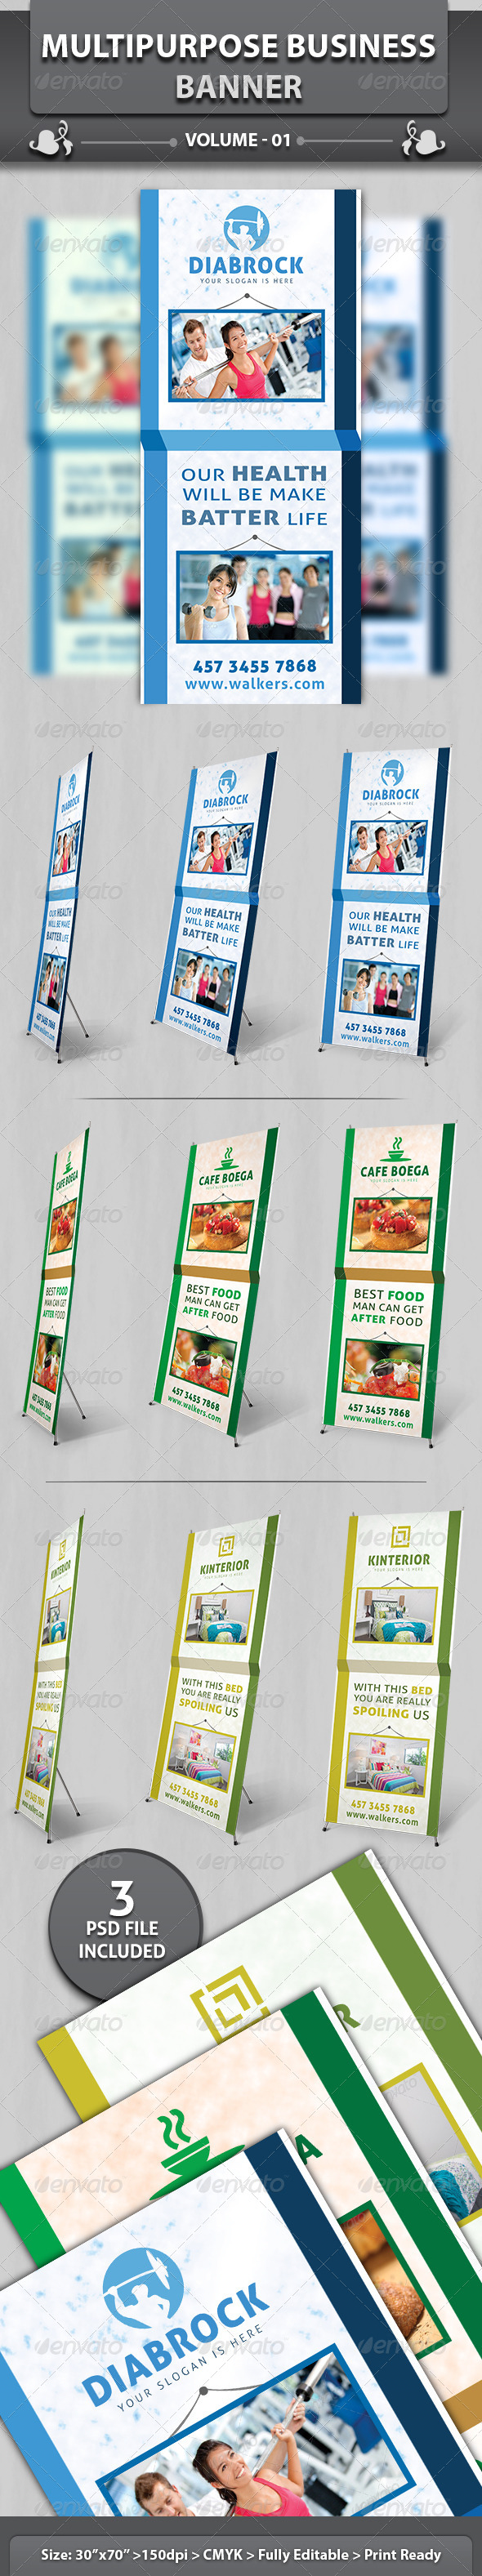 Multipurpose Business Banner | Volume 1 - Signage Print Templates